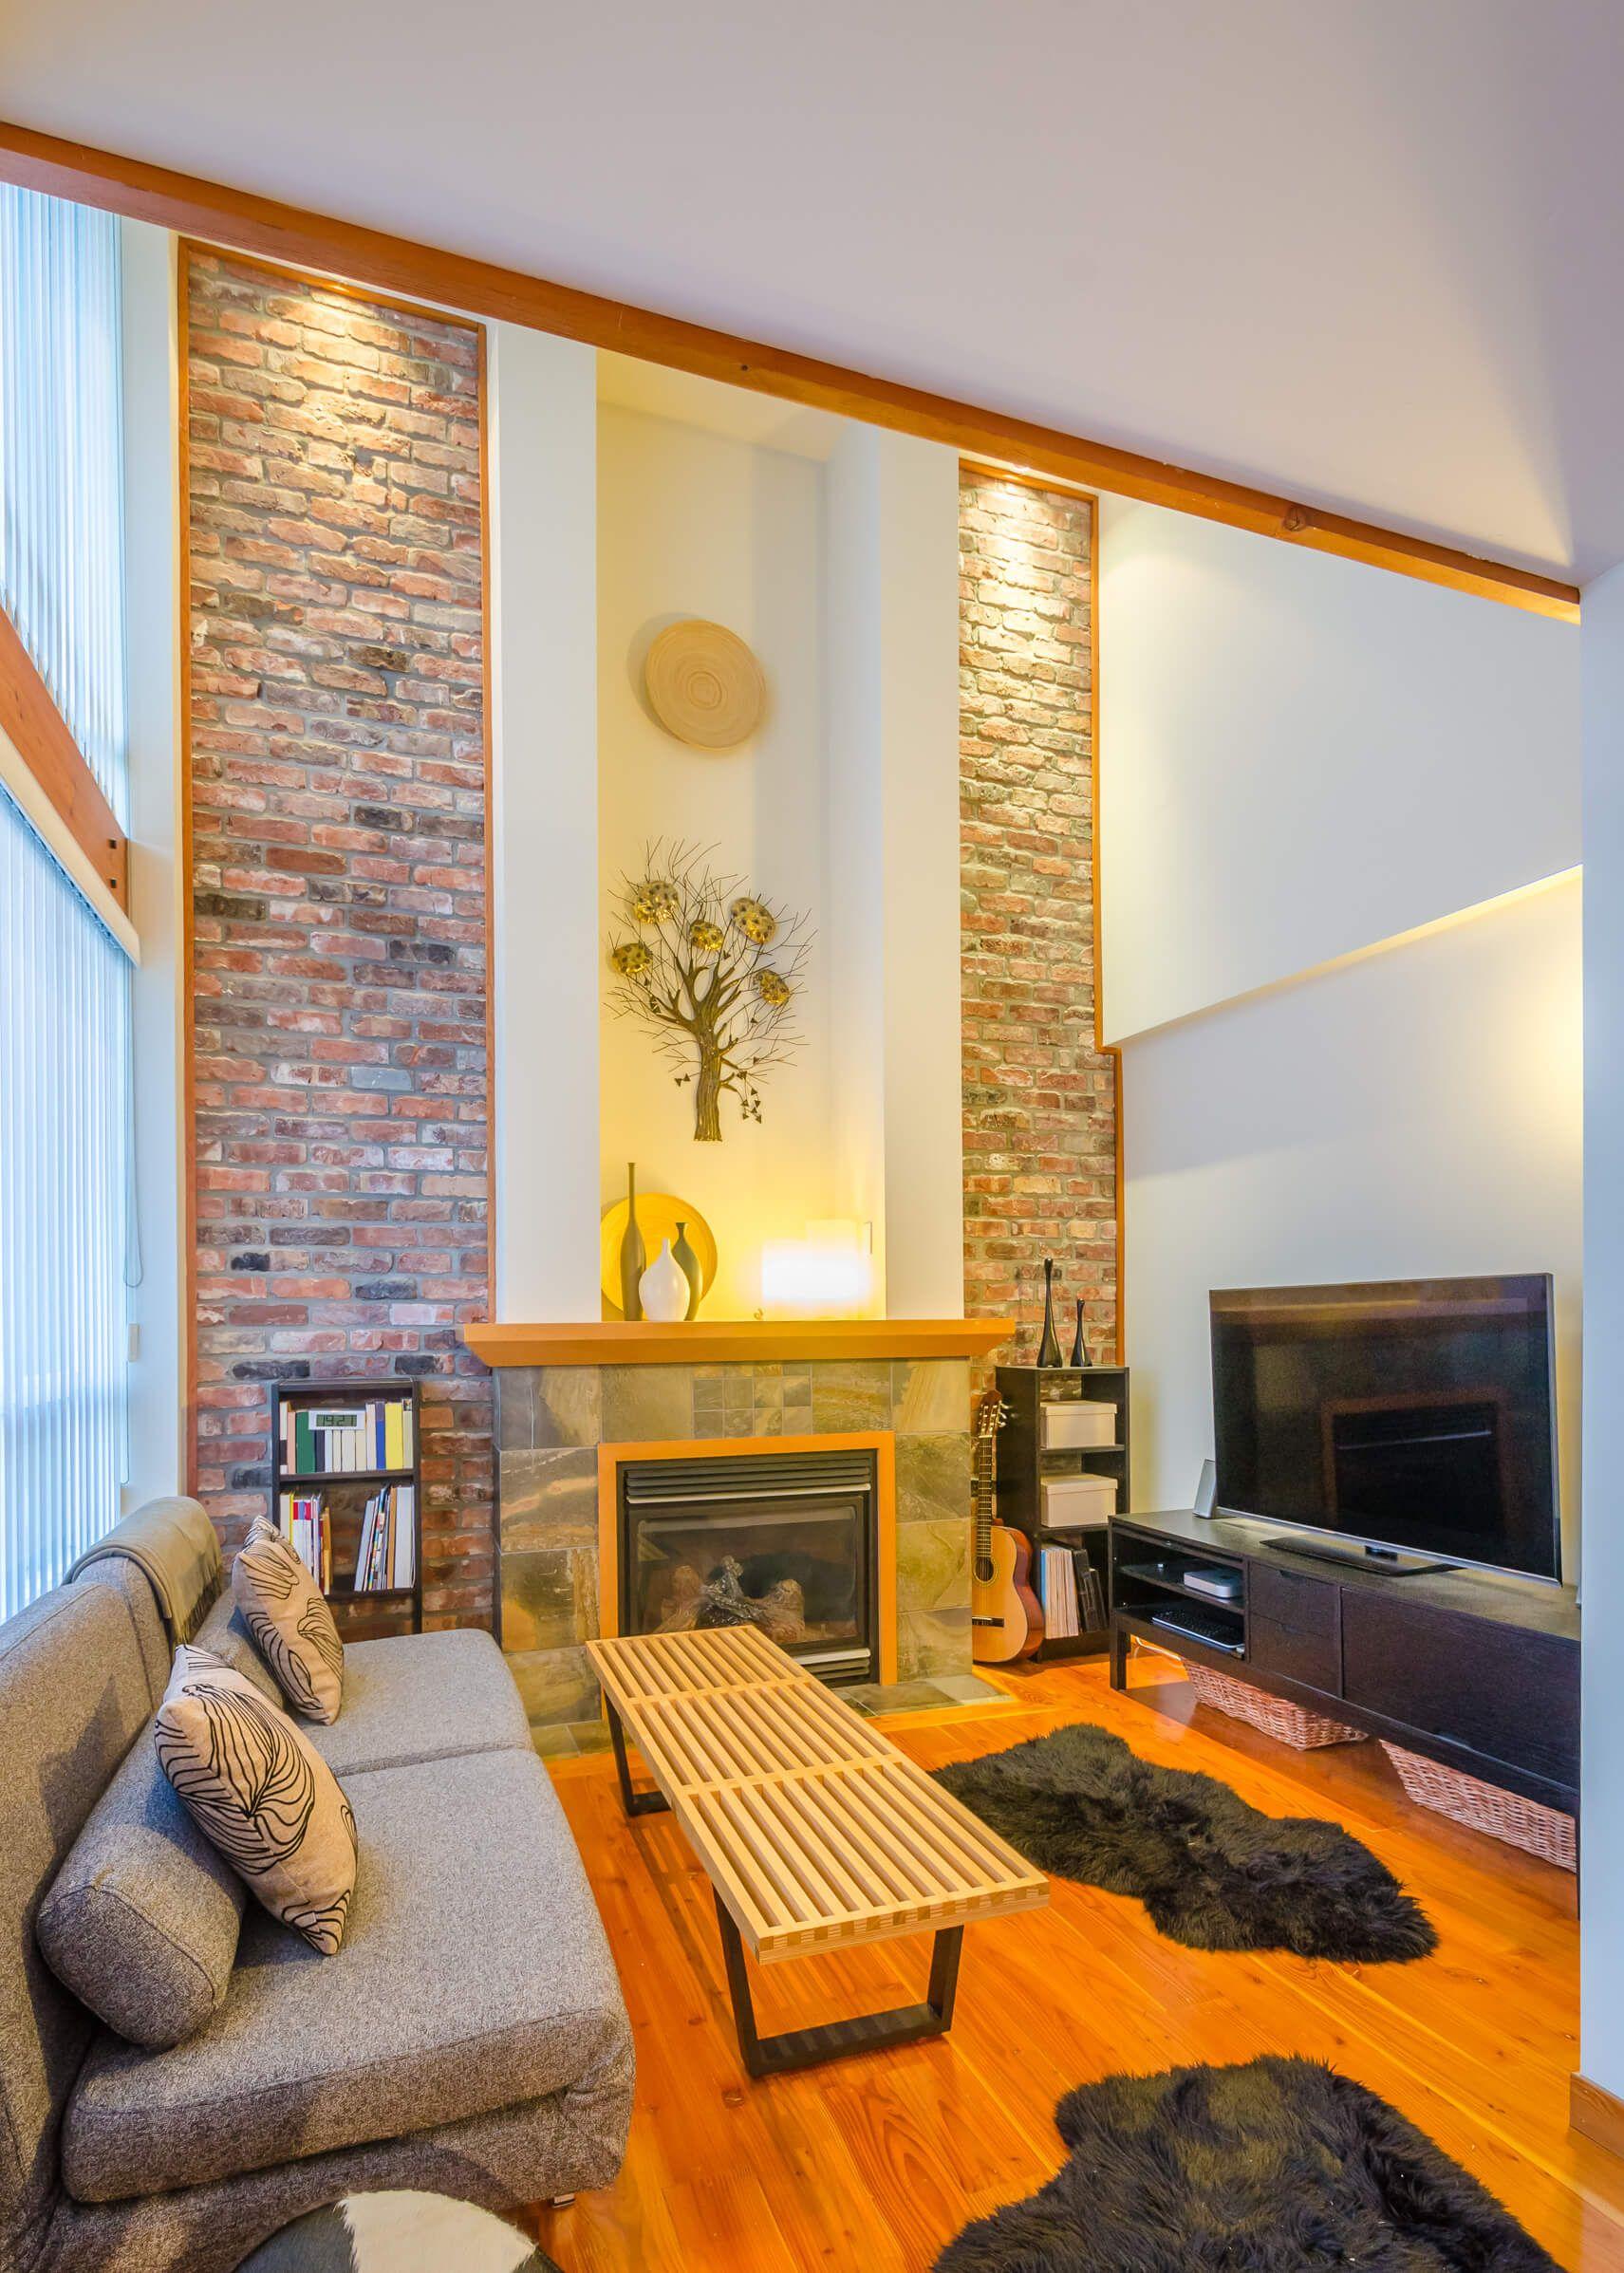 650 Formal Living Room Design Ideas for 2018 | Formal living rooms ...